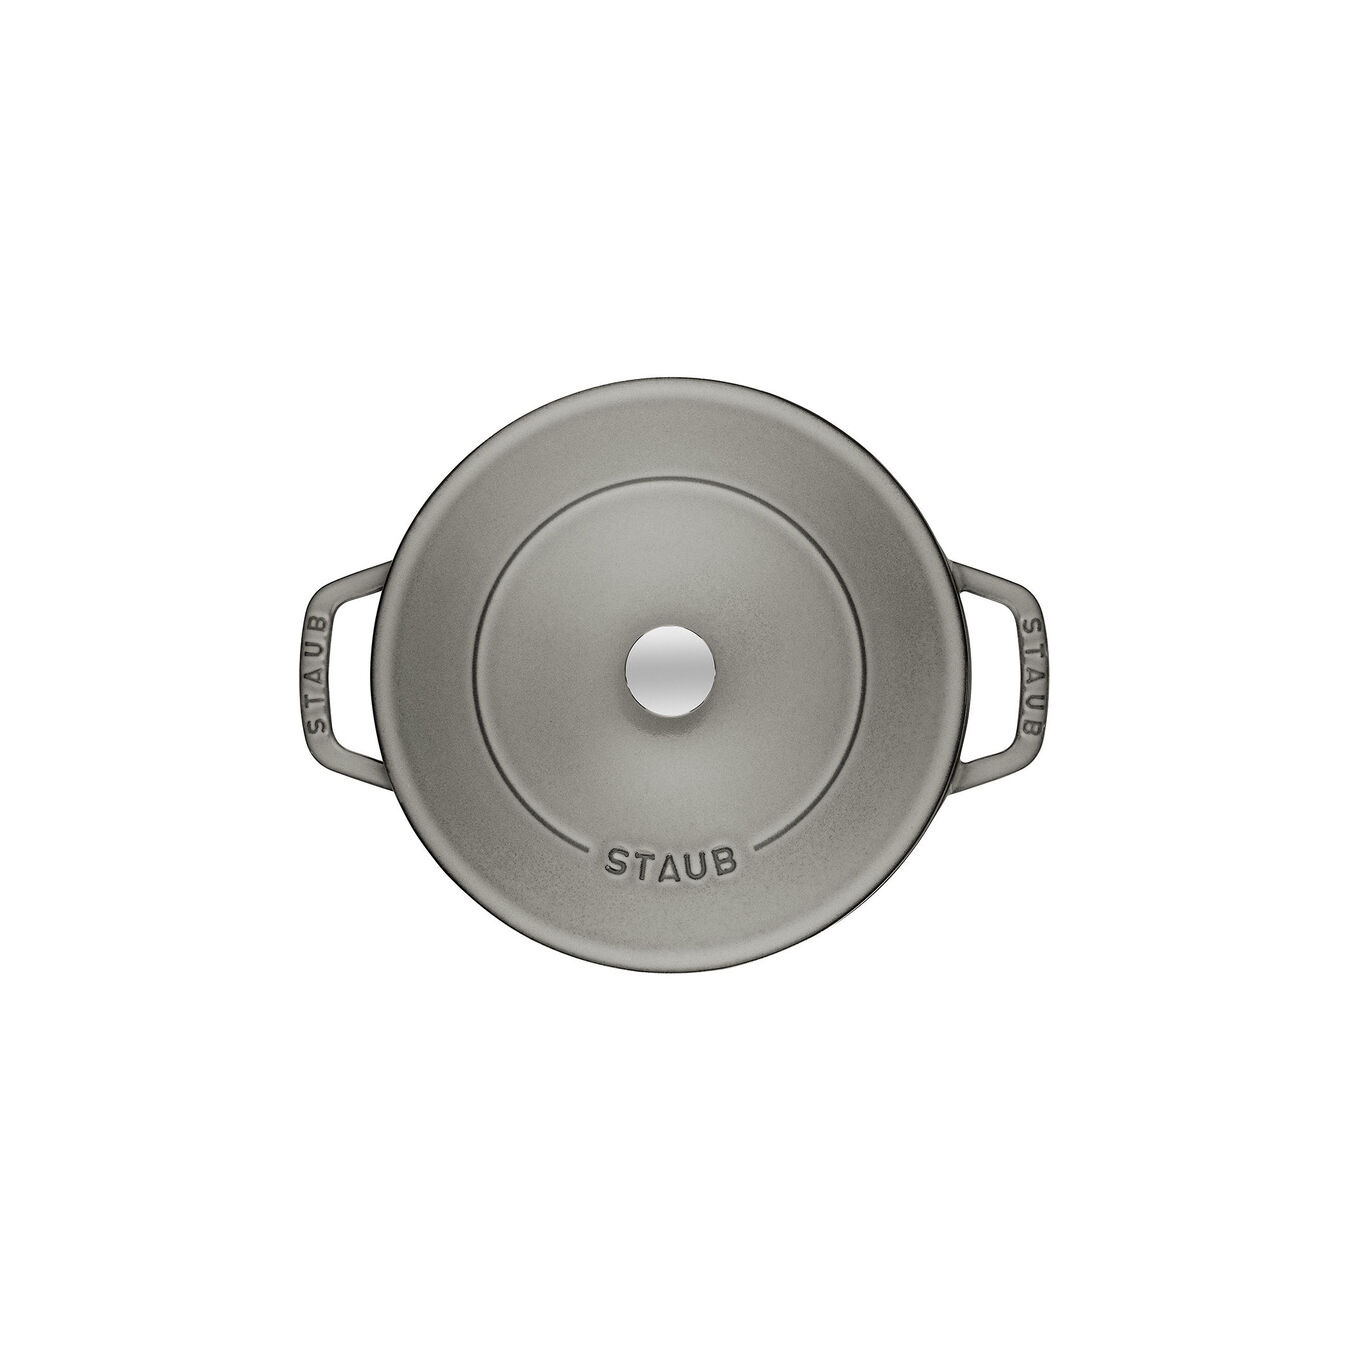 Caçarola redonda baixa chistera Chistera 28 cm, Ferro fundido,,large 5